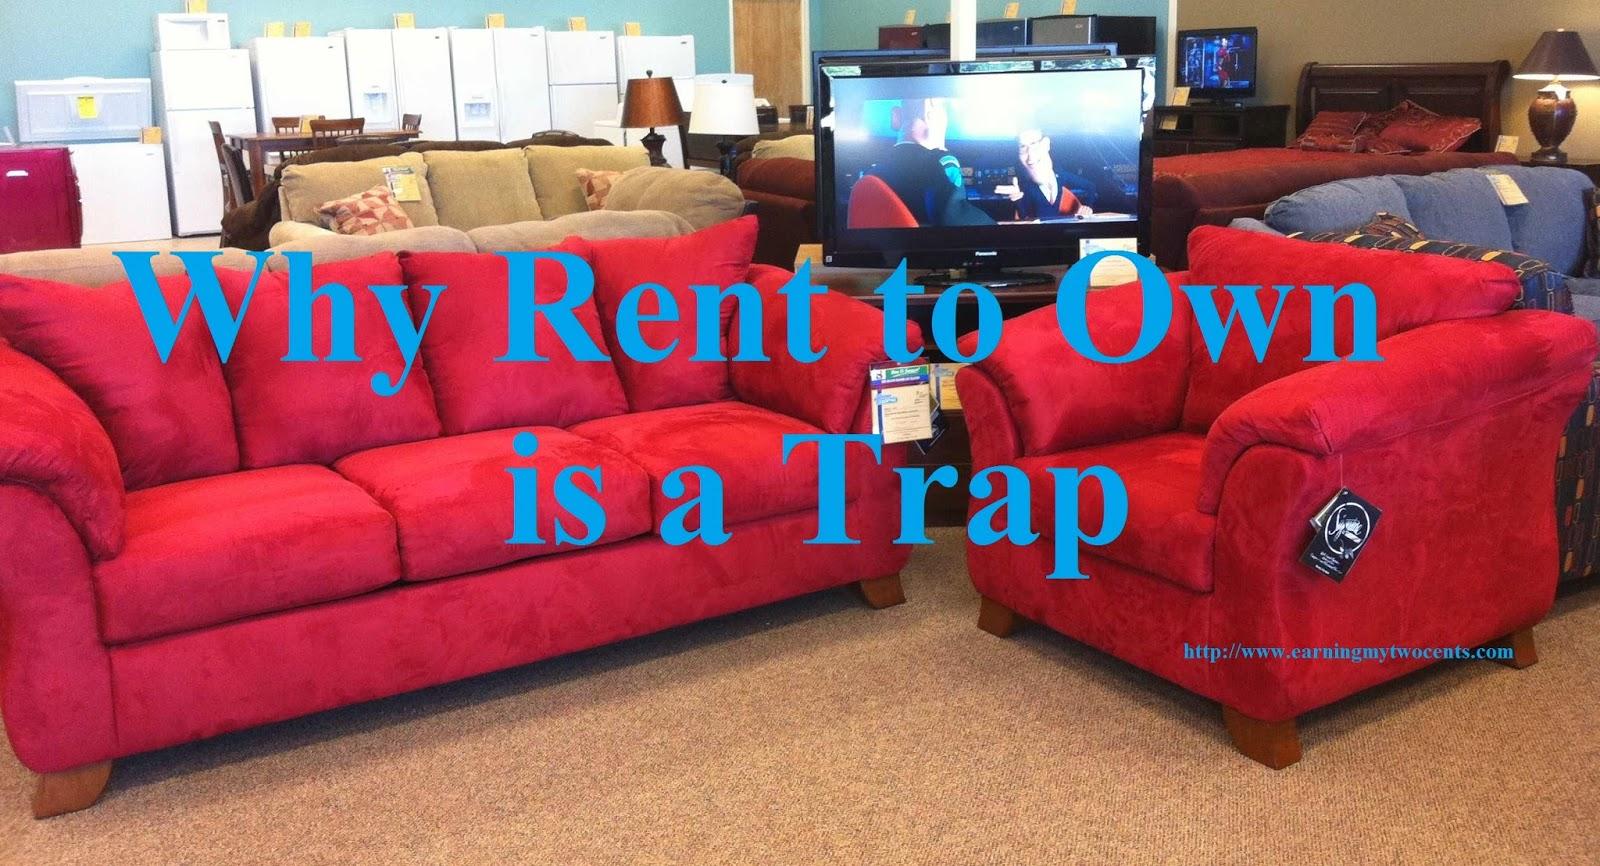 Rent To Own Sofas 2017 Sofa Design. Furniture rent to own